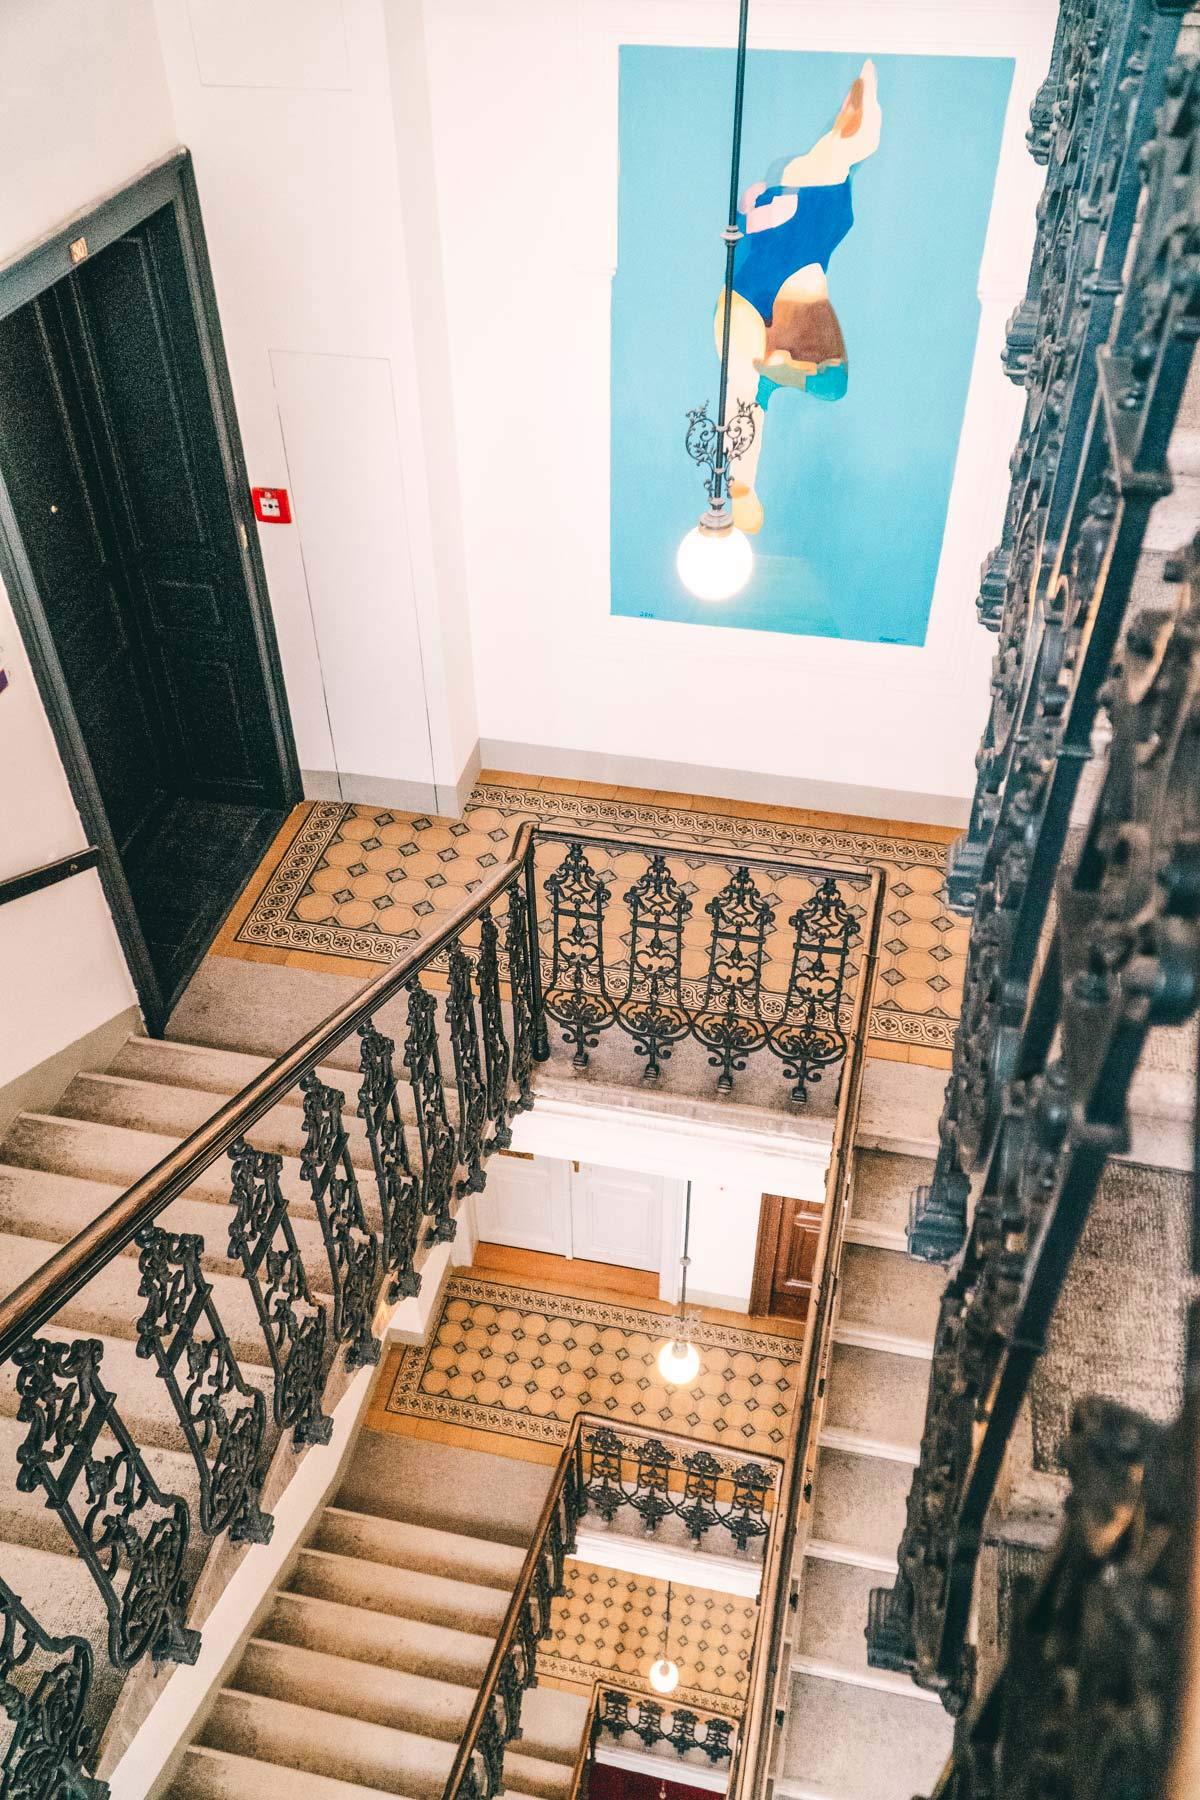 Treppenhaus in Wien